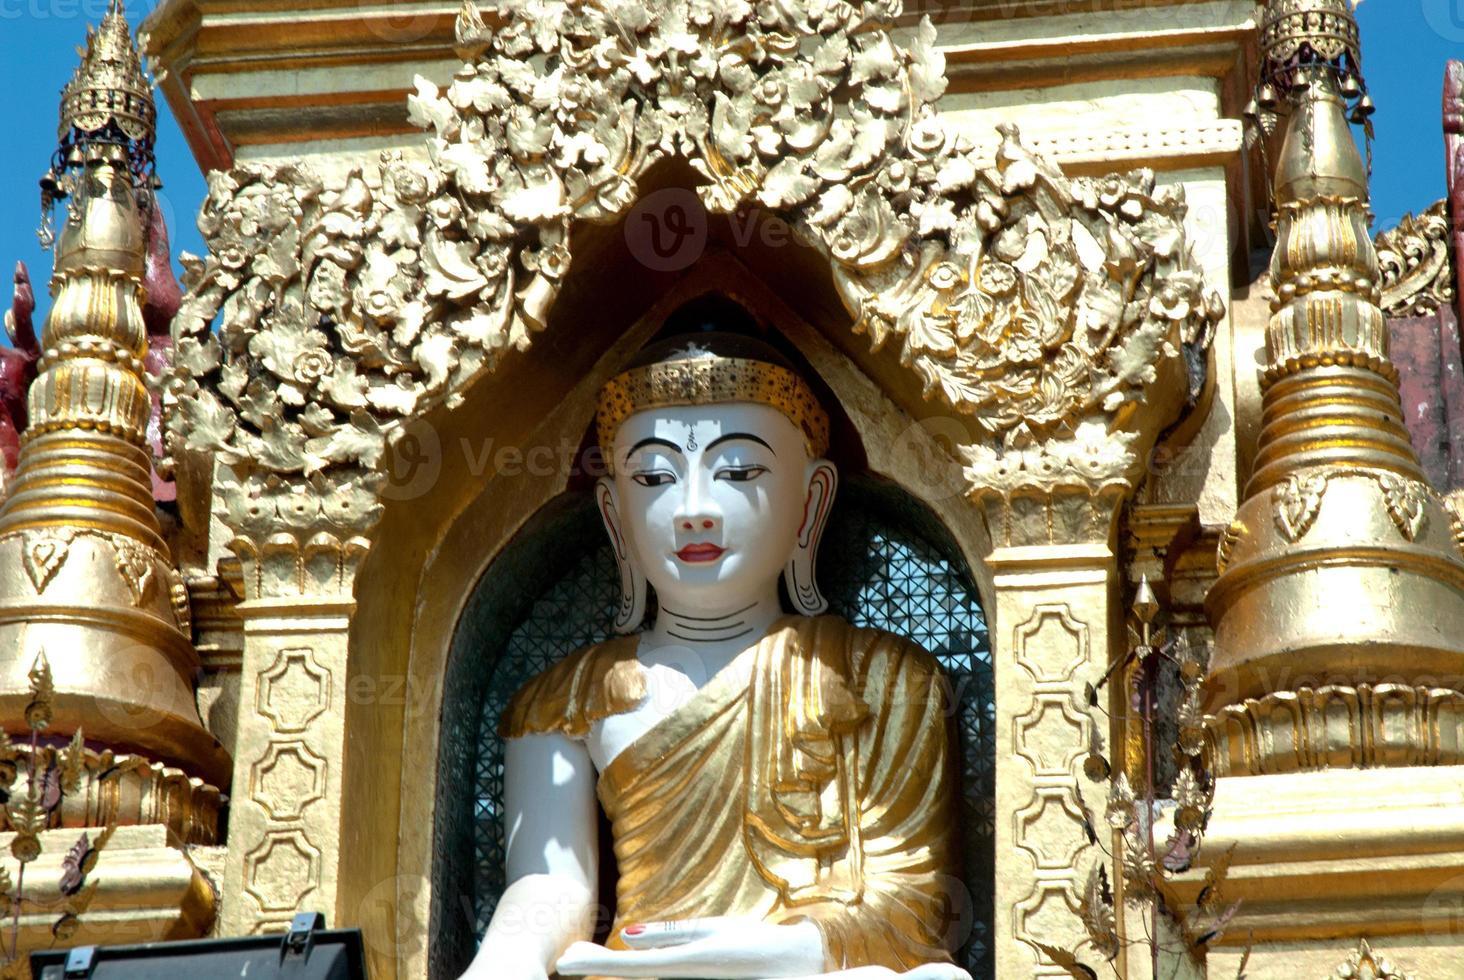 Buda blanco en la pagoda dorada, myanmar. foto